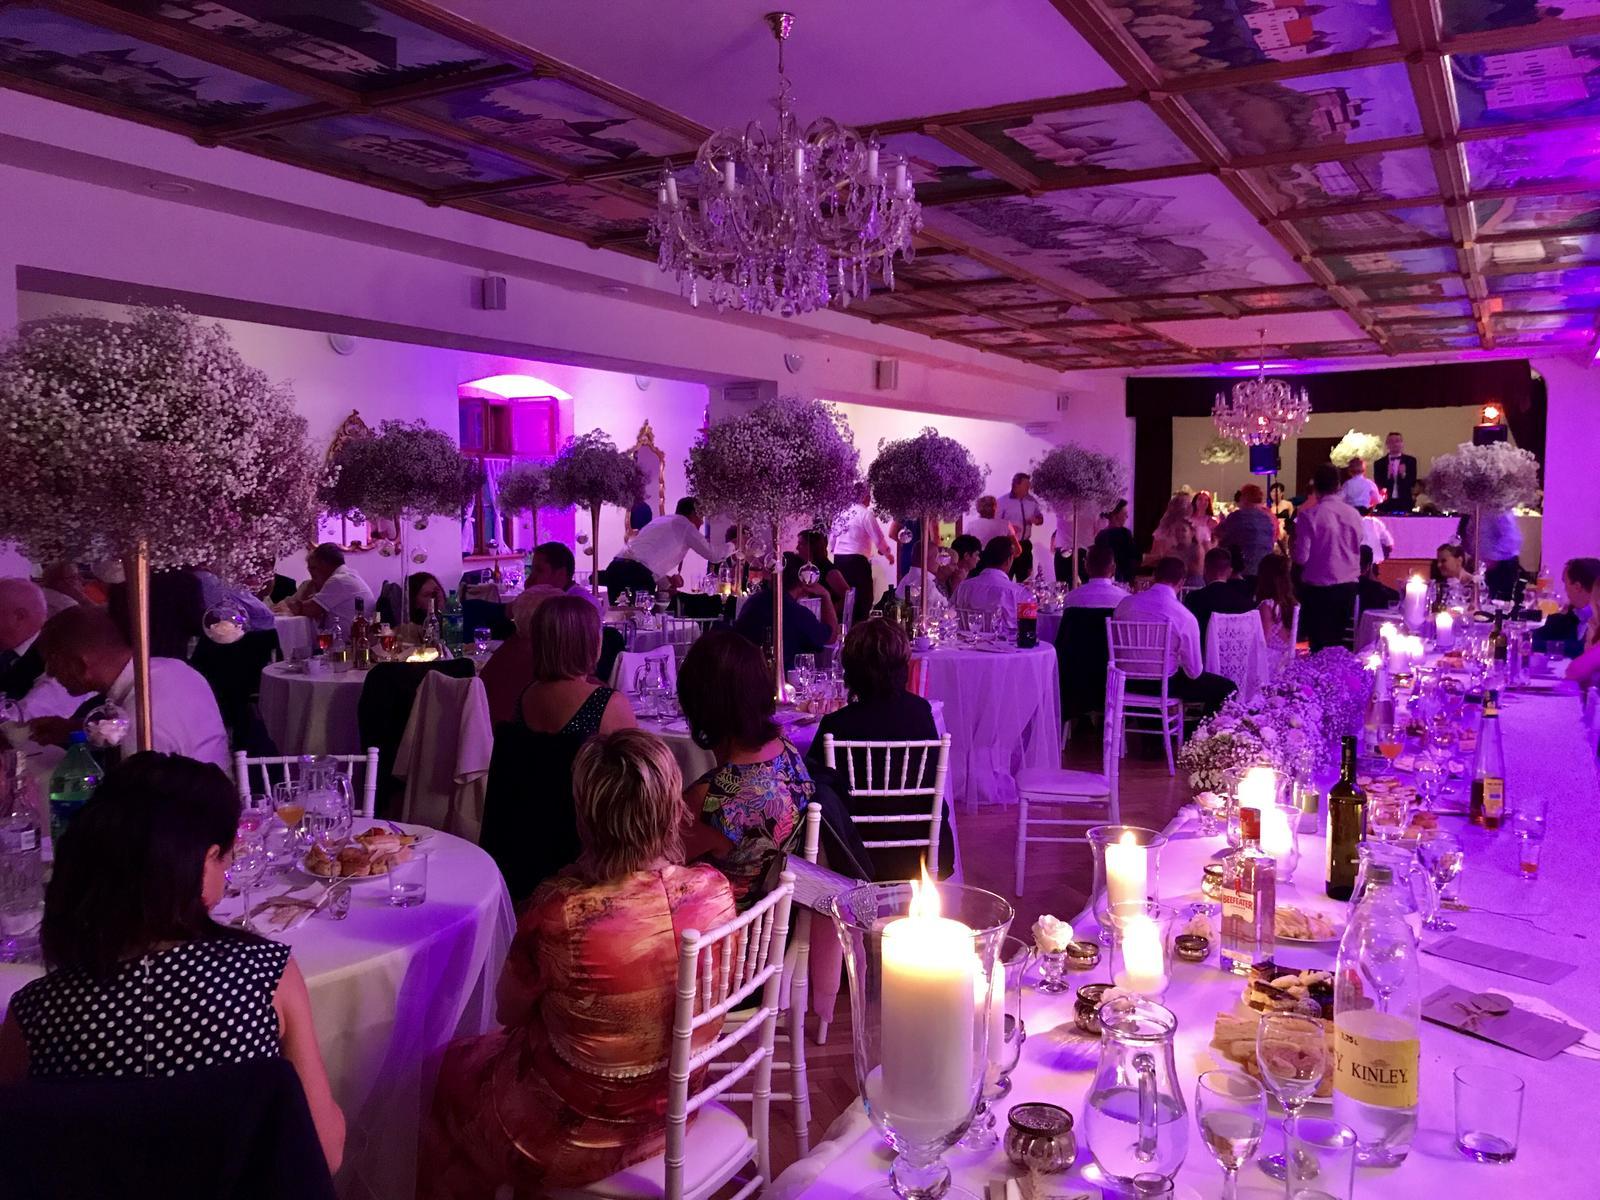 djmike - svadba Kaštieľ Krasňany